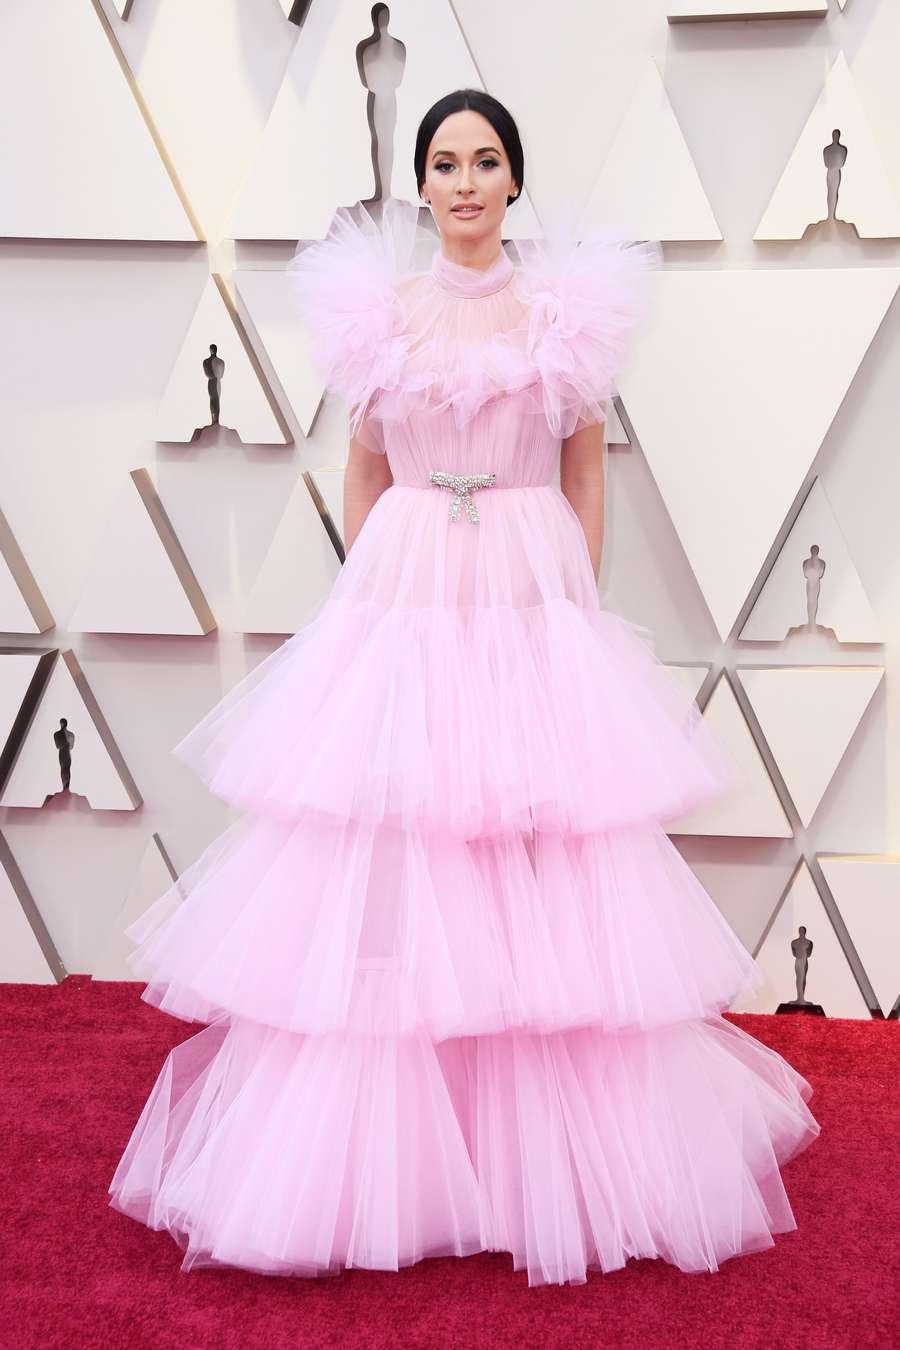 Kacey Musgraves hingga Constance Wu, Seleb Cantik di Oscar 2019